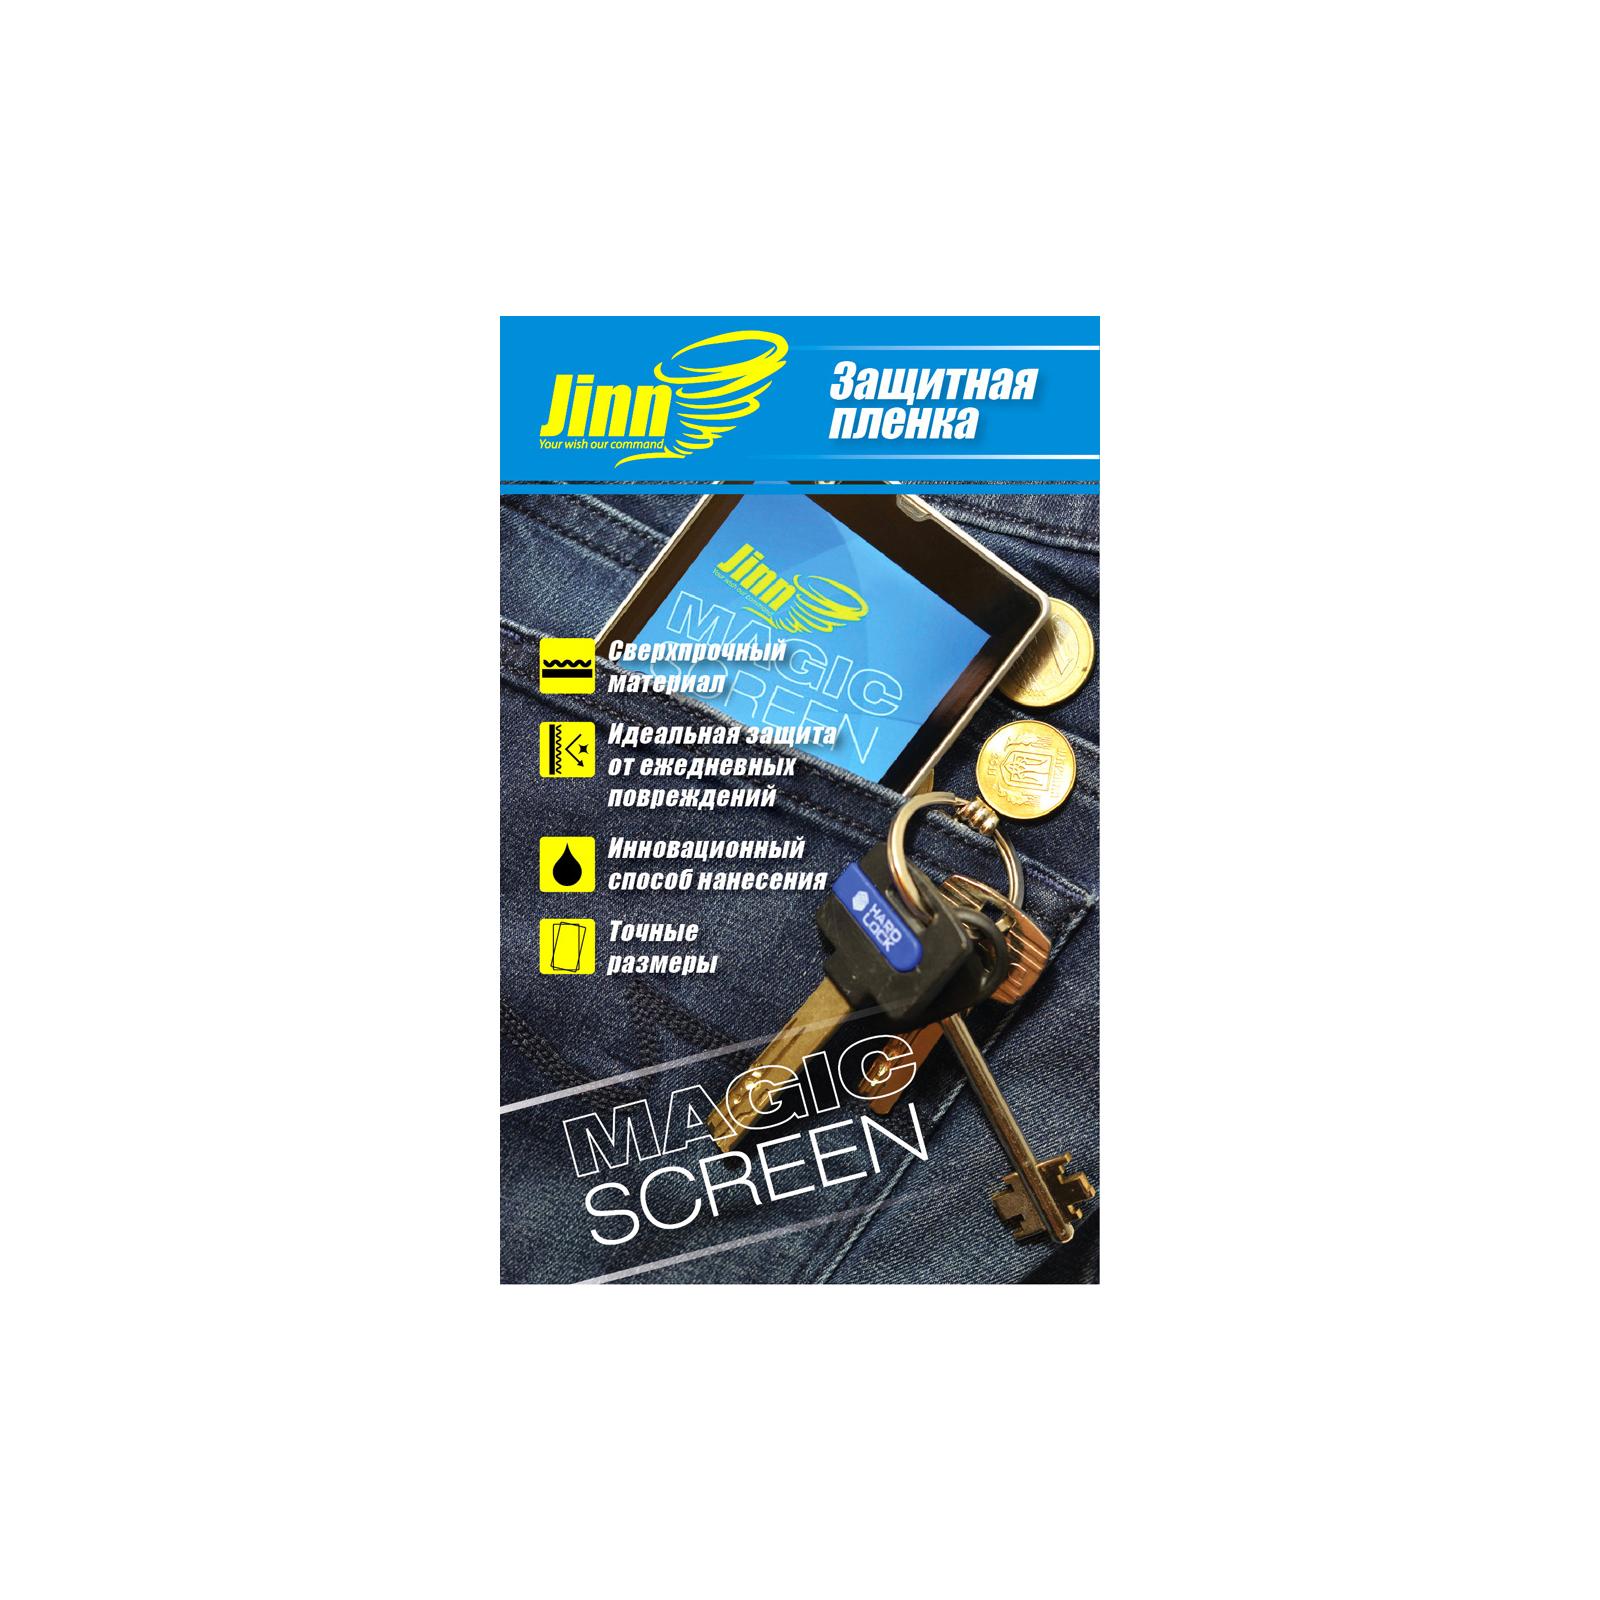 Пленка защитная JINN ультрапрочная Magic Screen для Samsung Galaxy Grand 2 G7102 (Samsung Galaxy Grand 2 front)